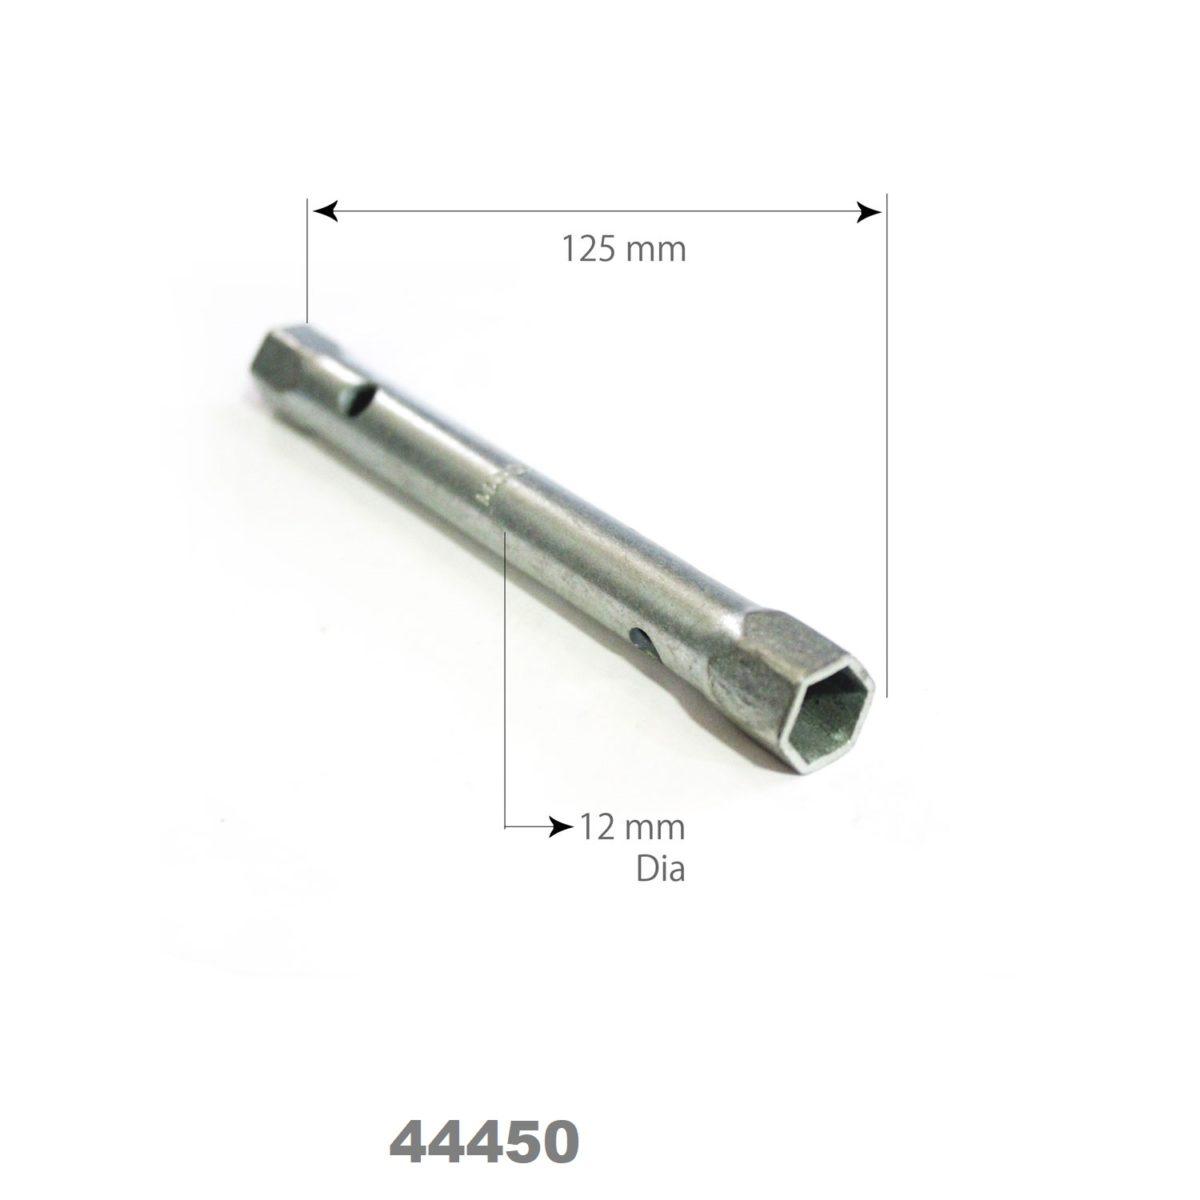 SARV Spark Plug Spanner 10 x11mm, Spark plug removing tool